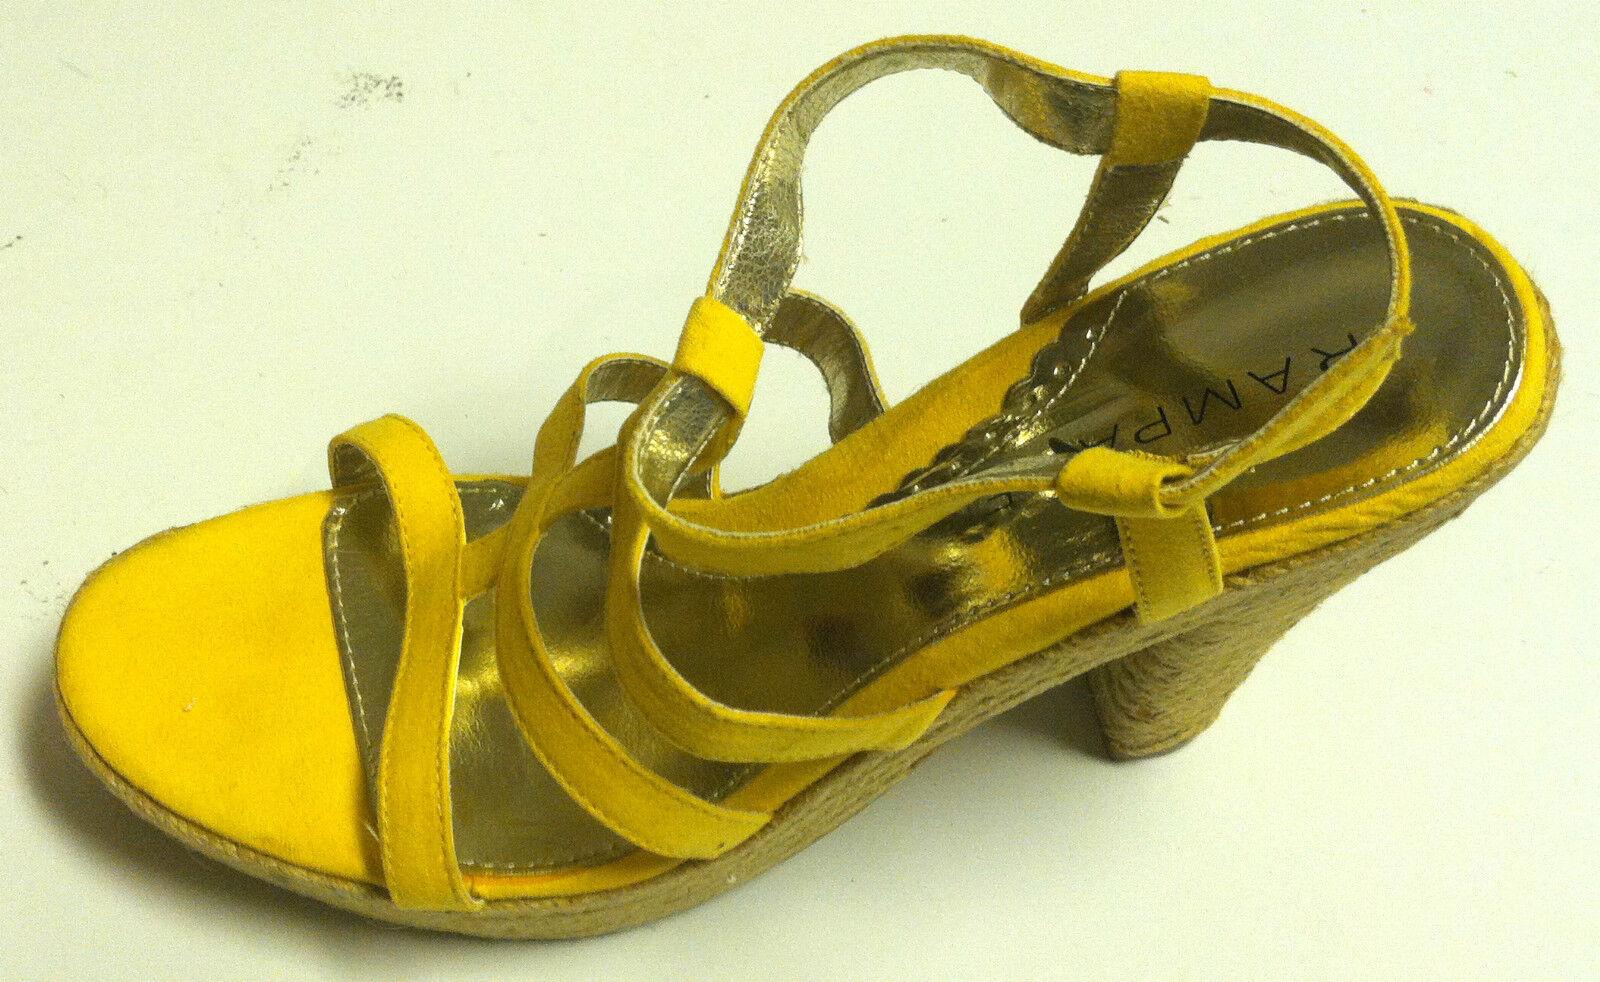 Rampage - Schuhe - Gelb NWOB - Sz 10 - NWOB Gelb - B-SHO-5 e9e1de